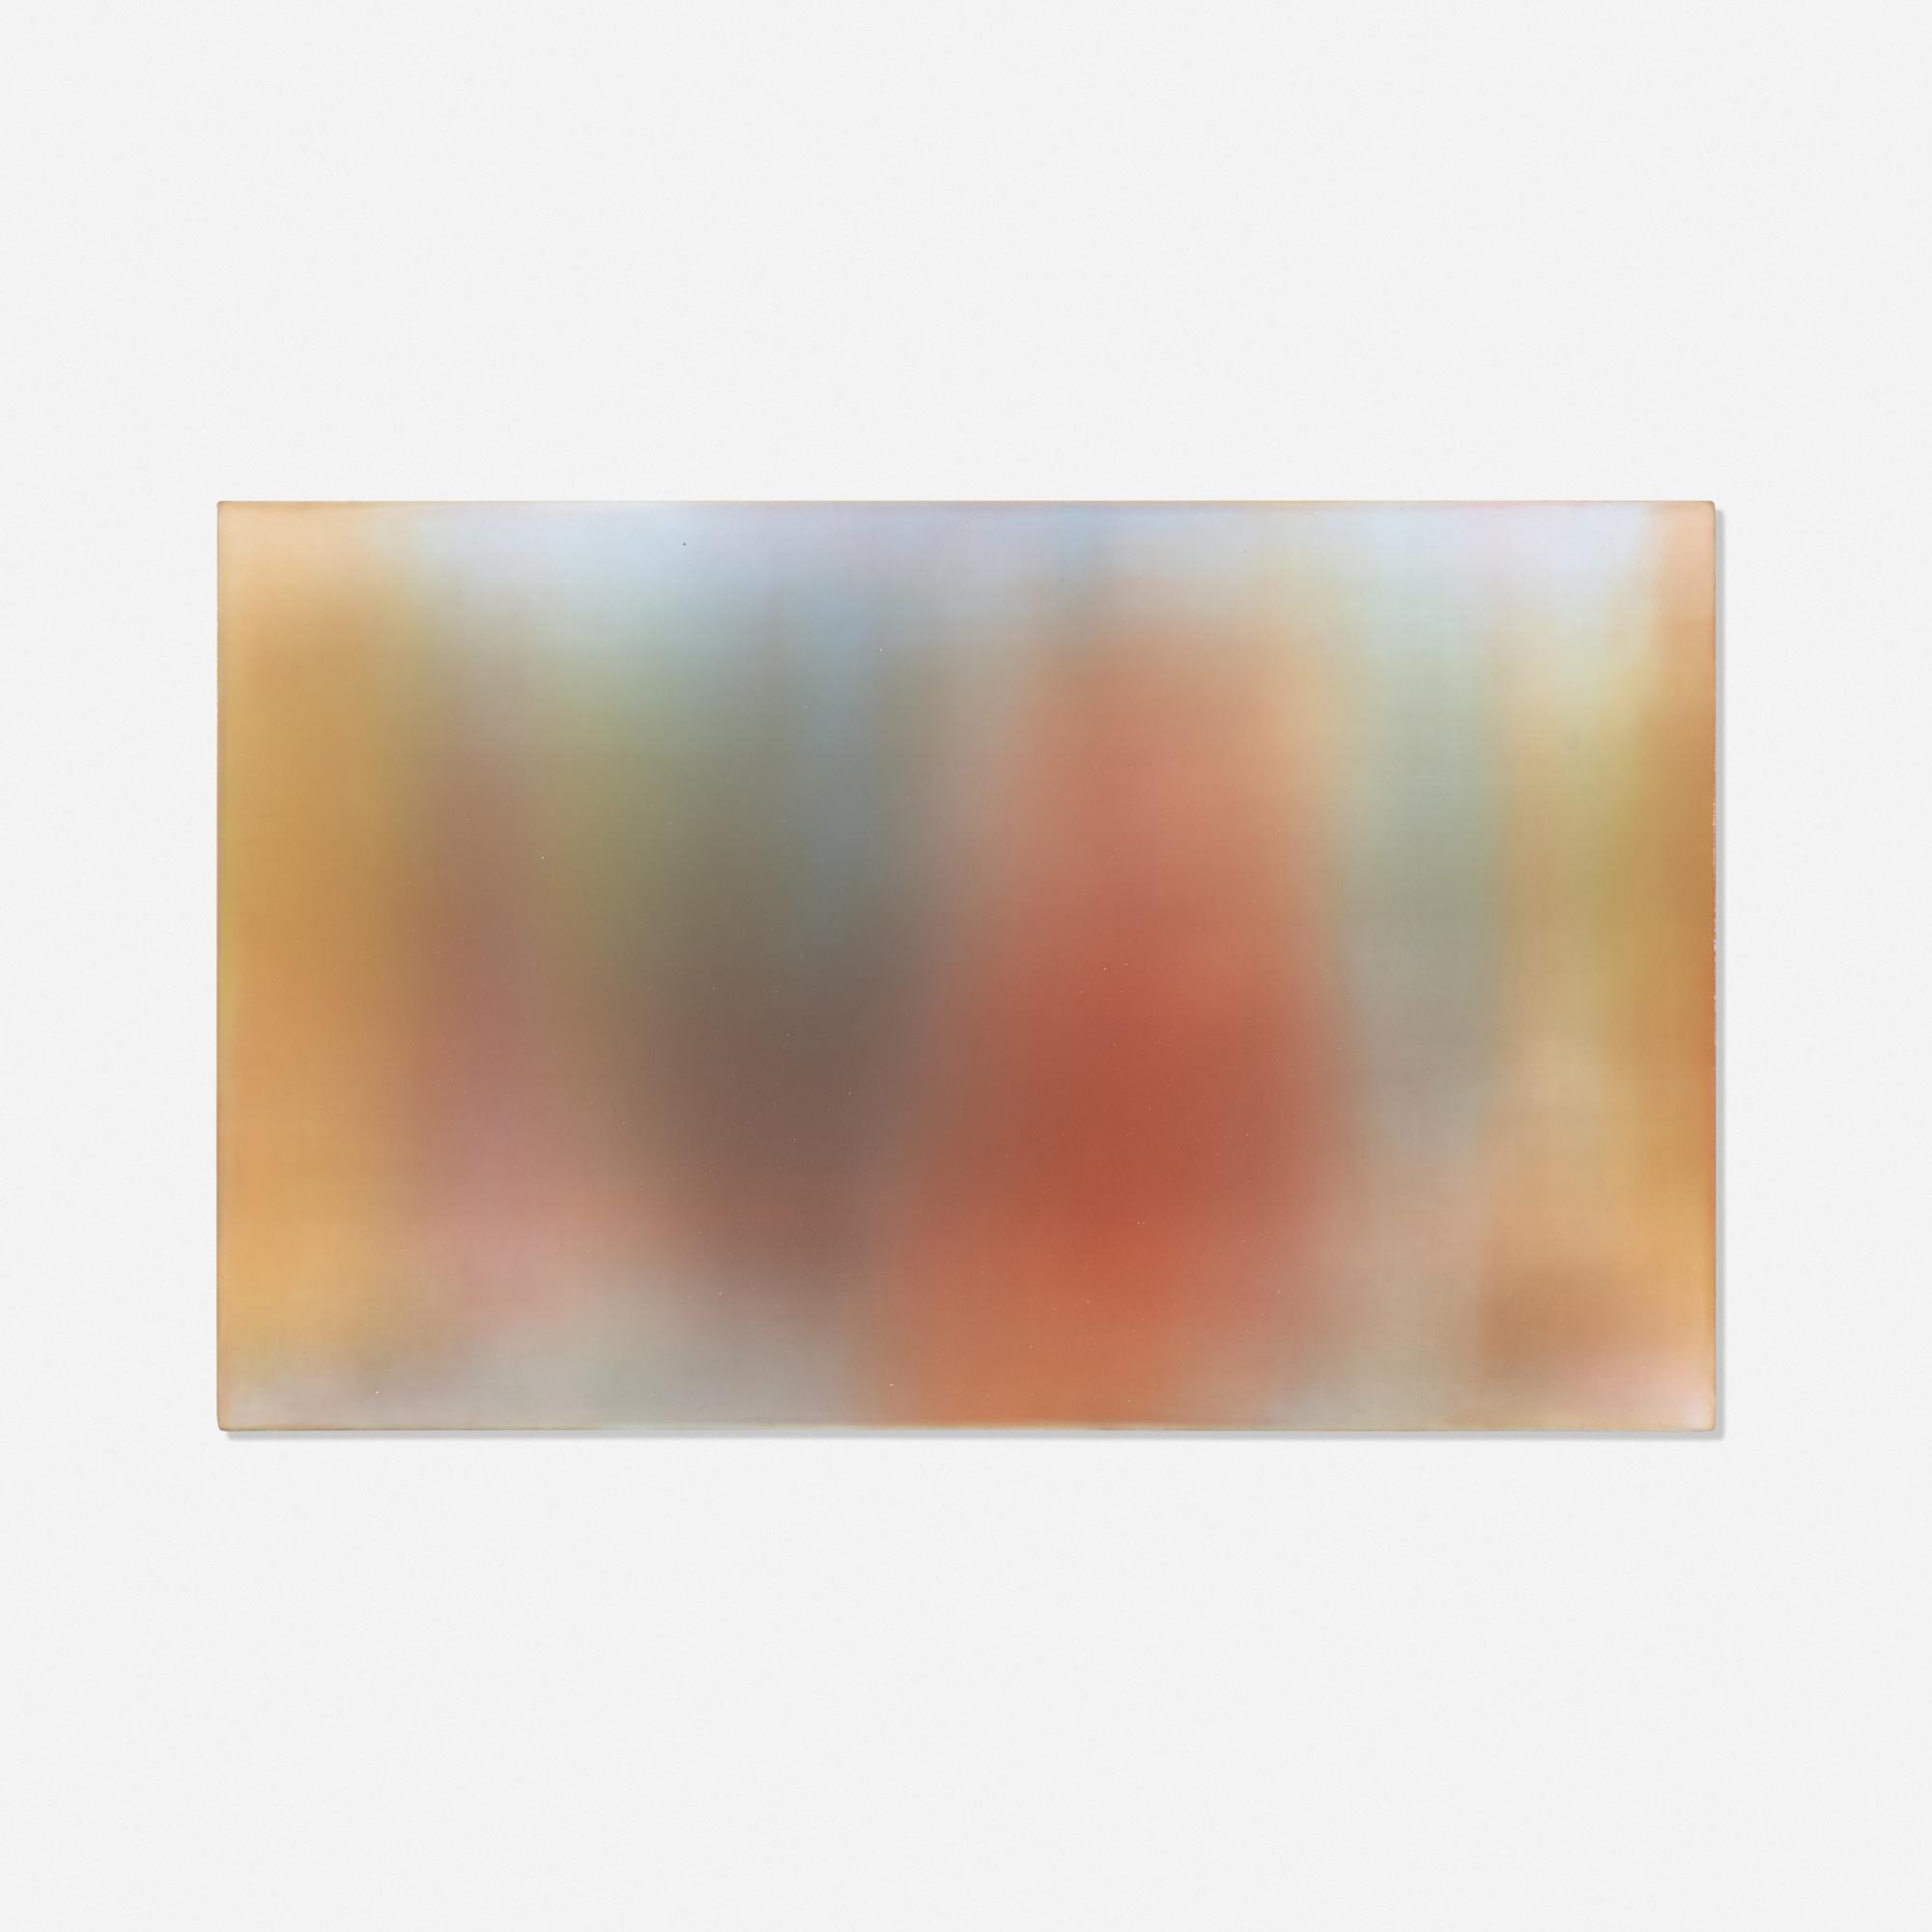 138: Prudencio Irazabal / Untitled 3D1 (1 of 1)